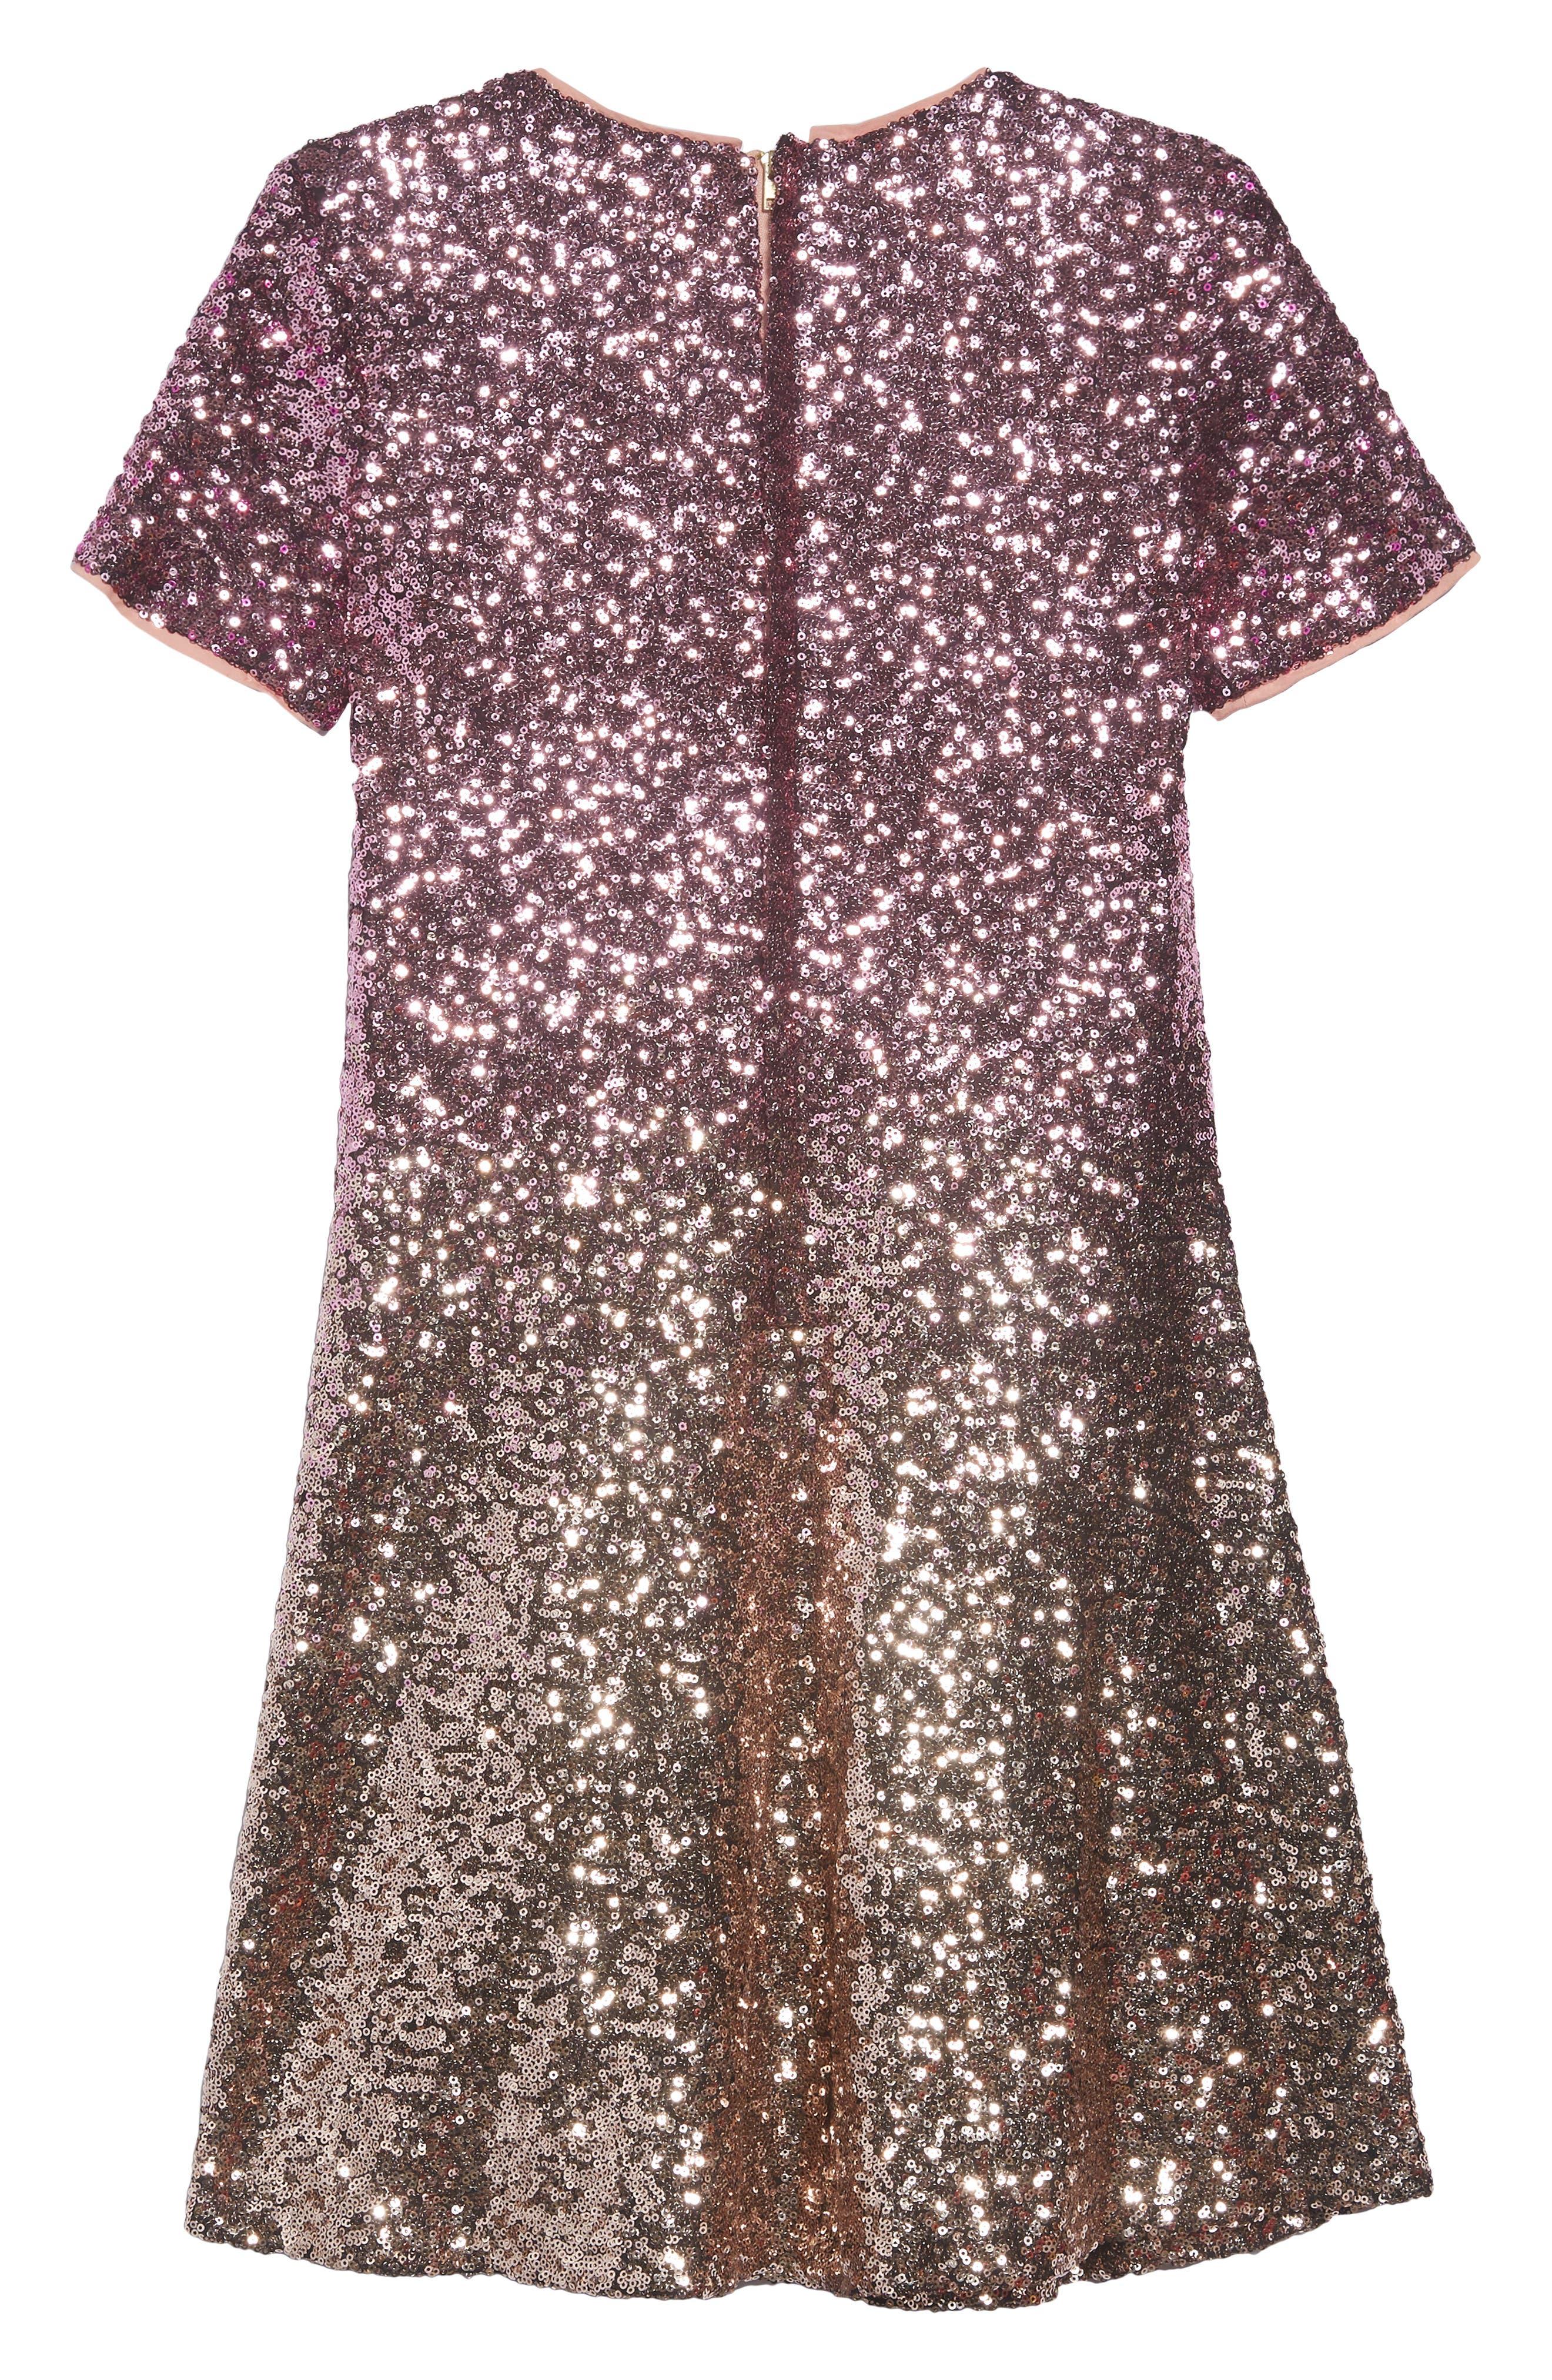 Ombré Sequin Skater Dress,                             Alternate thumbnail 2, color,                             Vanish Gold Sequins